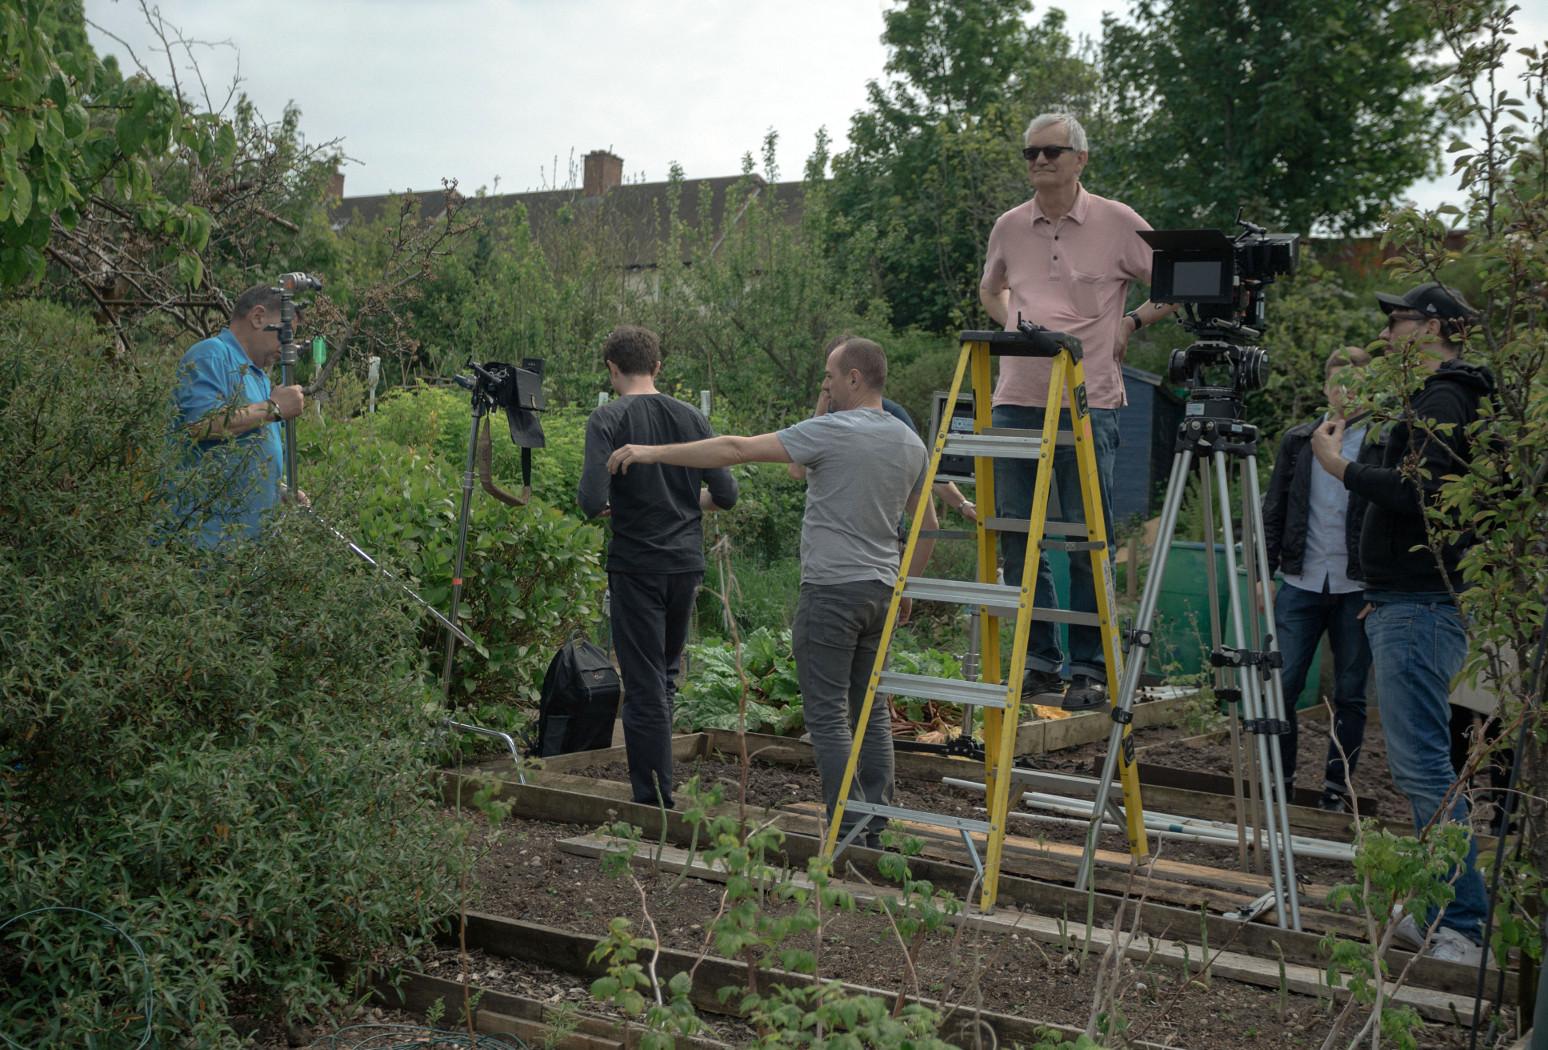 BBC Oneness - Allotment, Smethwick, Photographer: MILO LETHORN